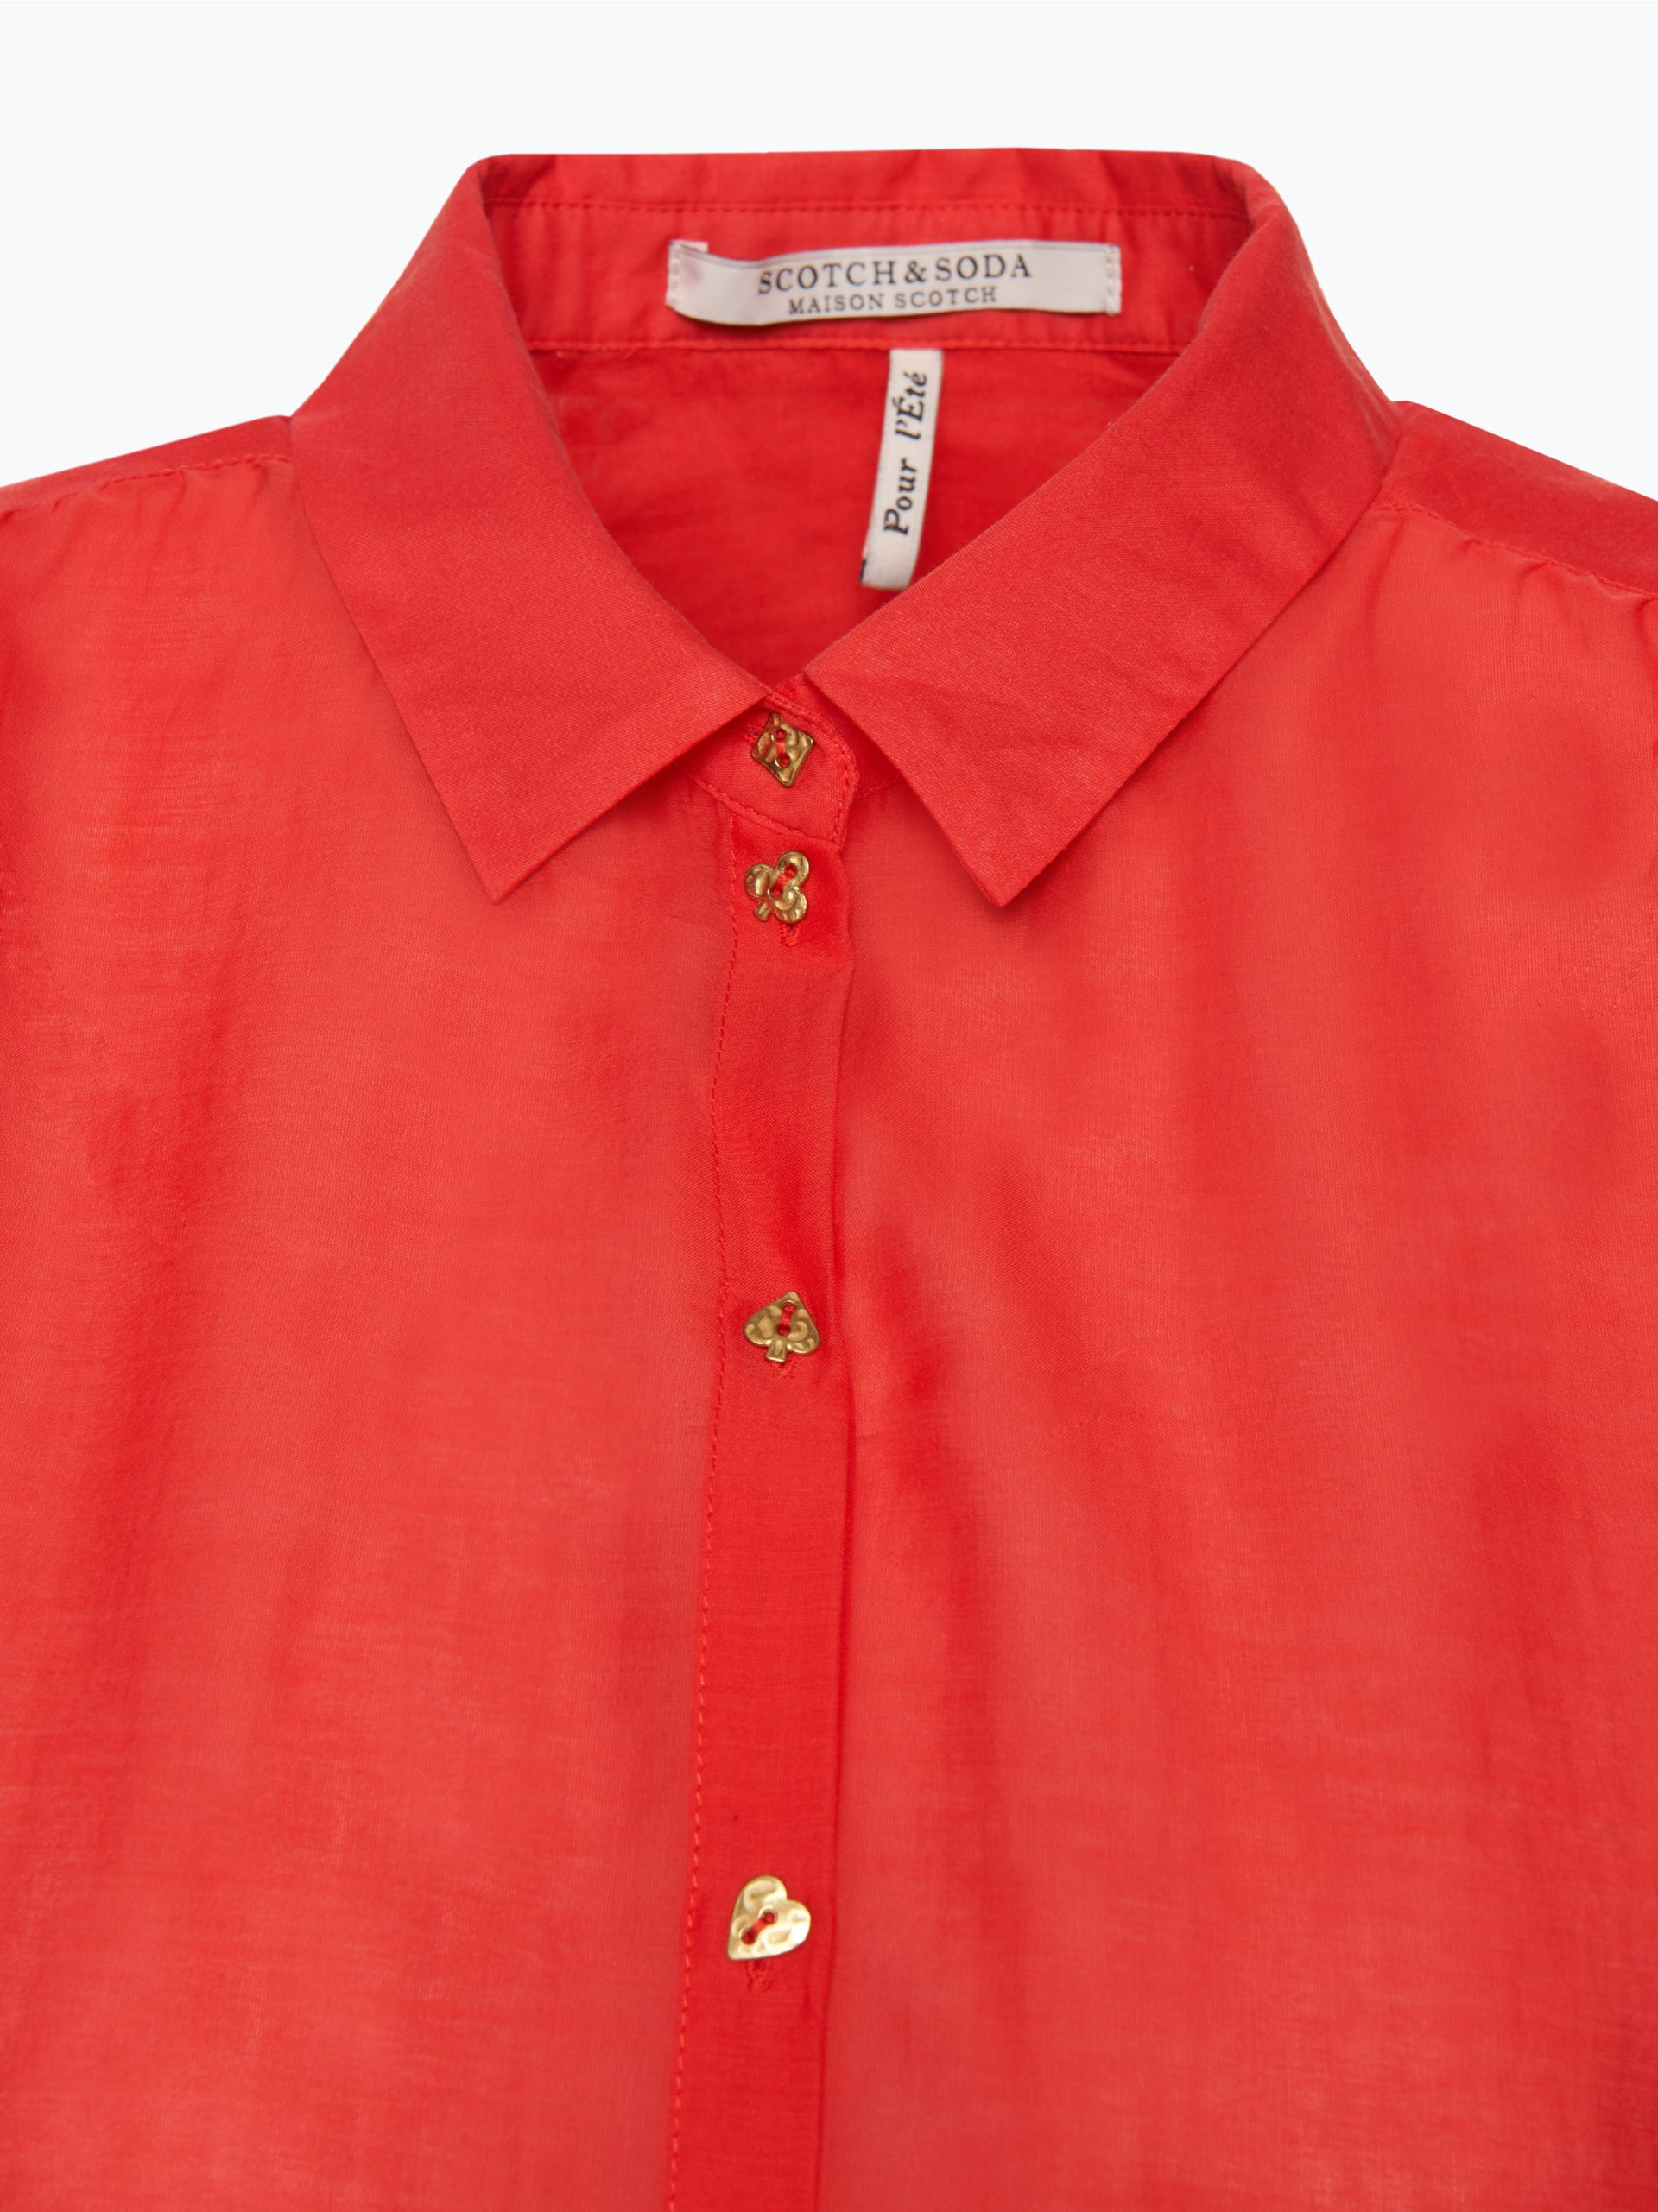 scotch soda damen bluse mit seiden anteil rot uni online. Black Bedroom Furniture Sets. Home Design Ideas